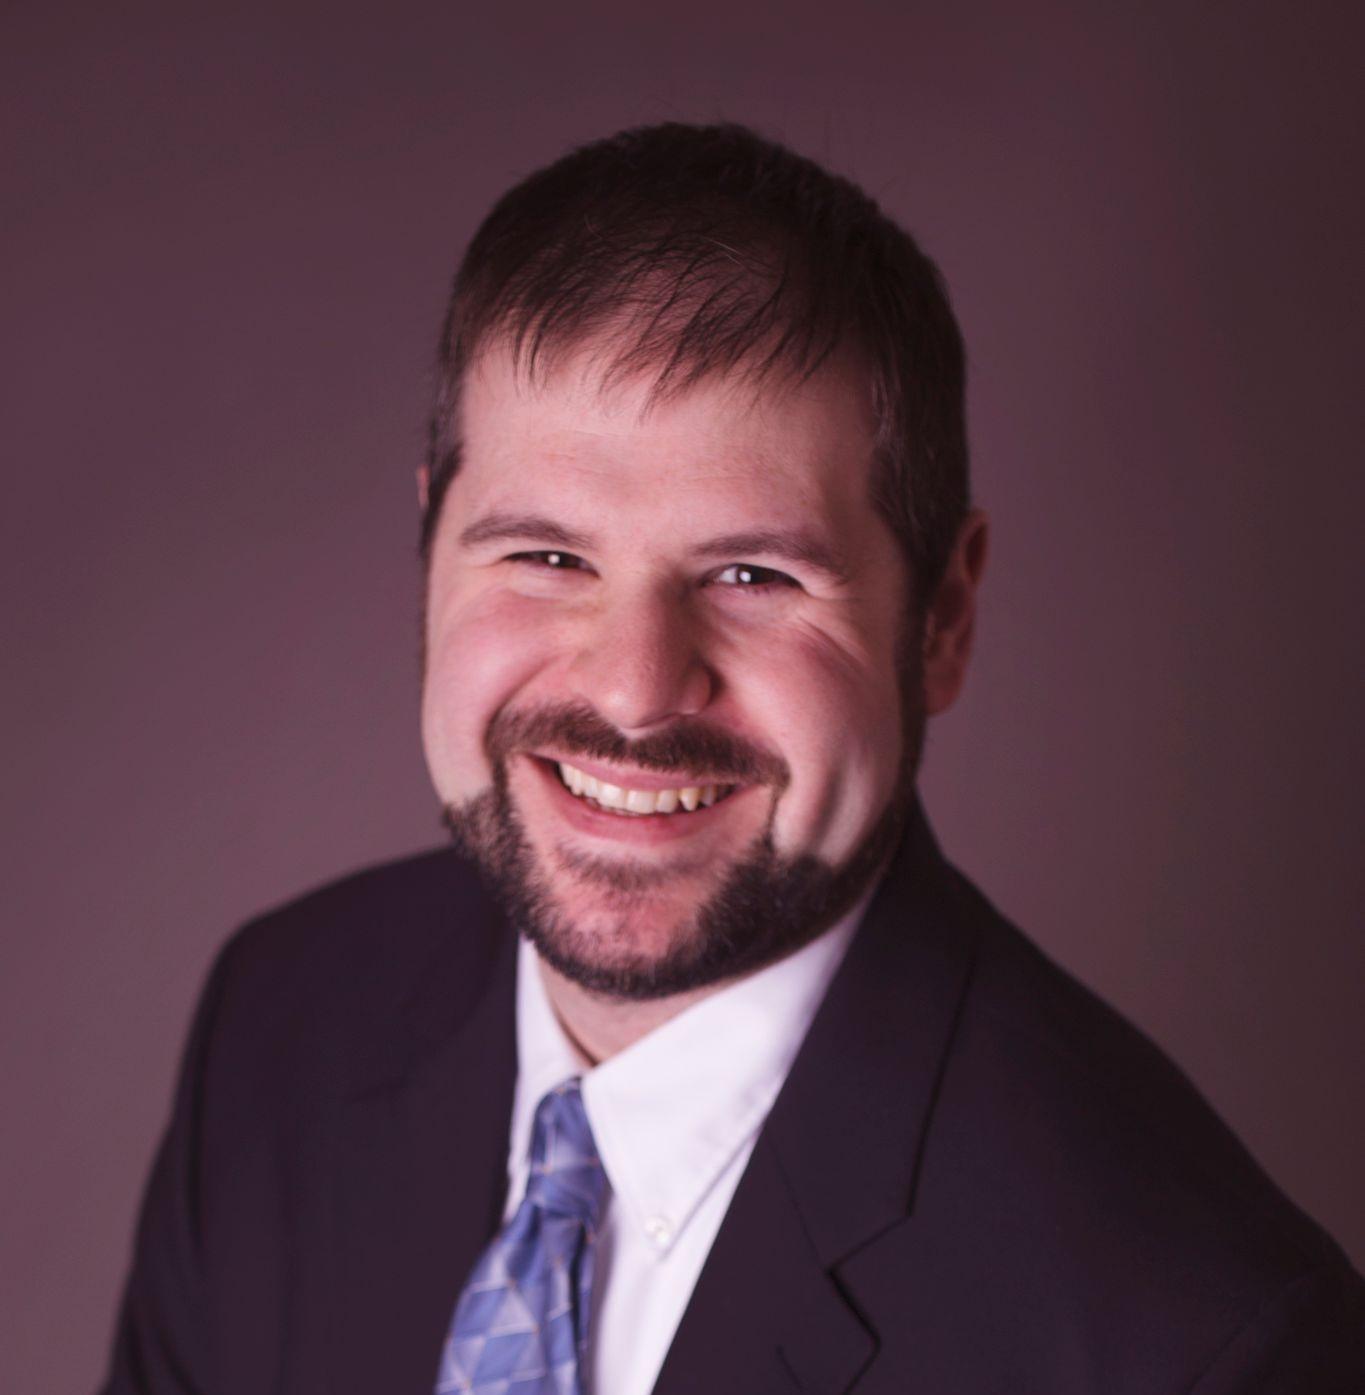 U.S. Faster Payments Council Names Walmart Executive Reed Luhtanen as its New Executive Director